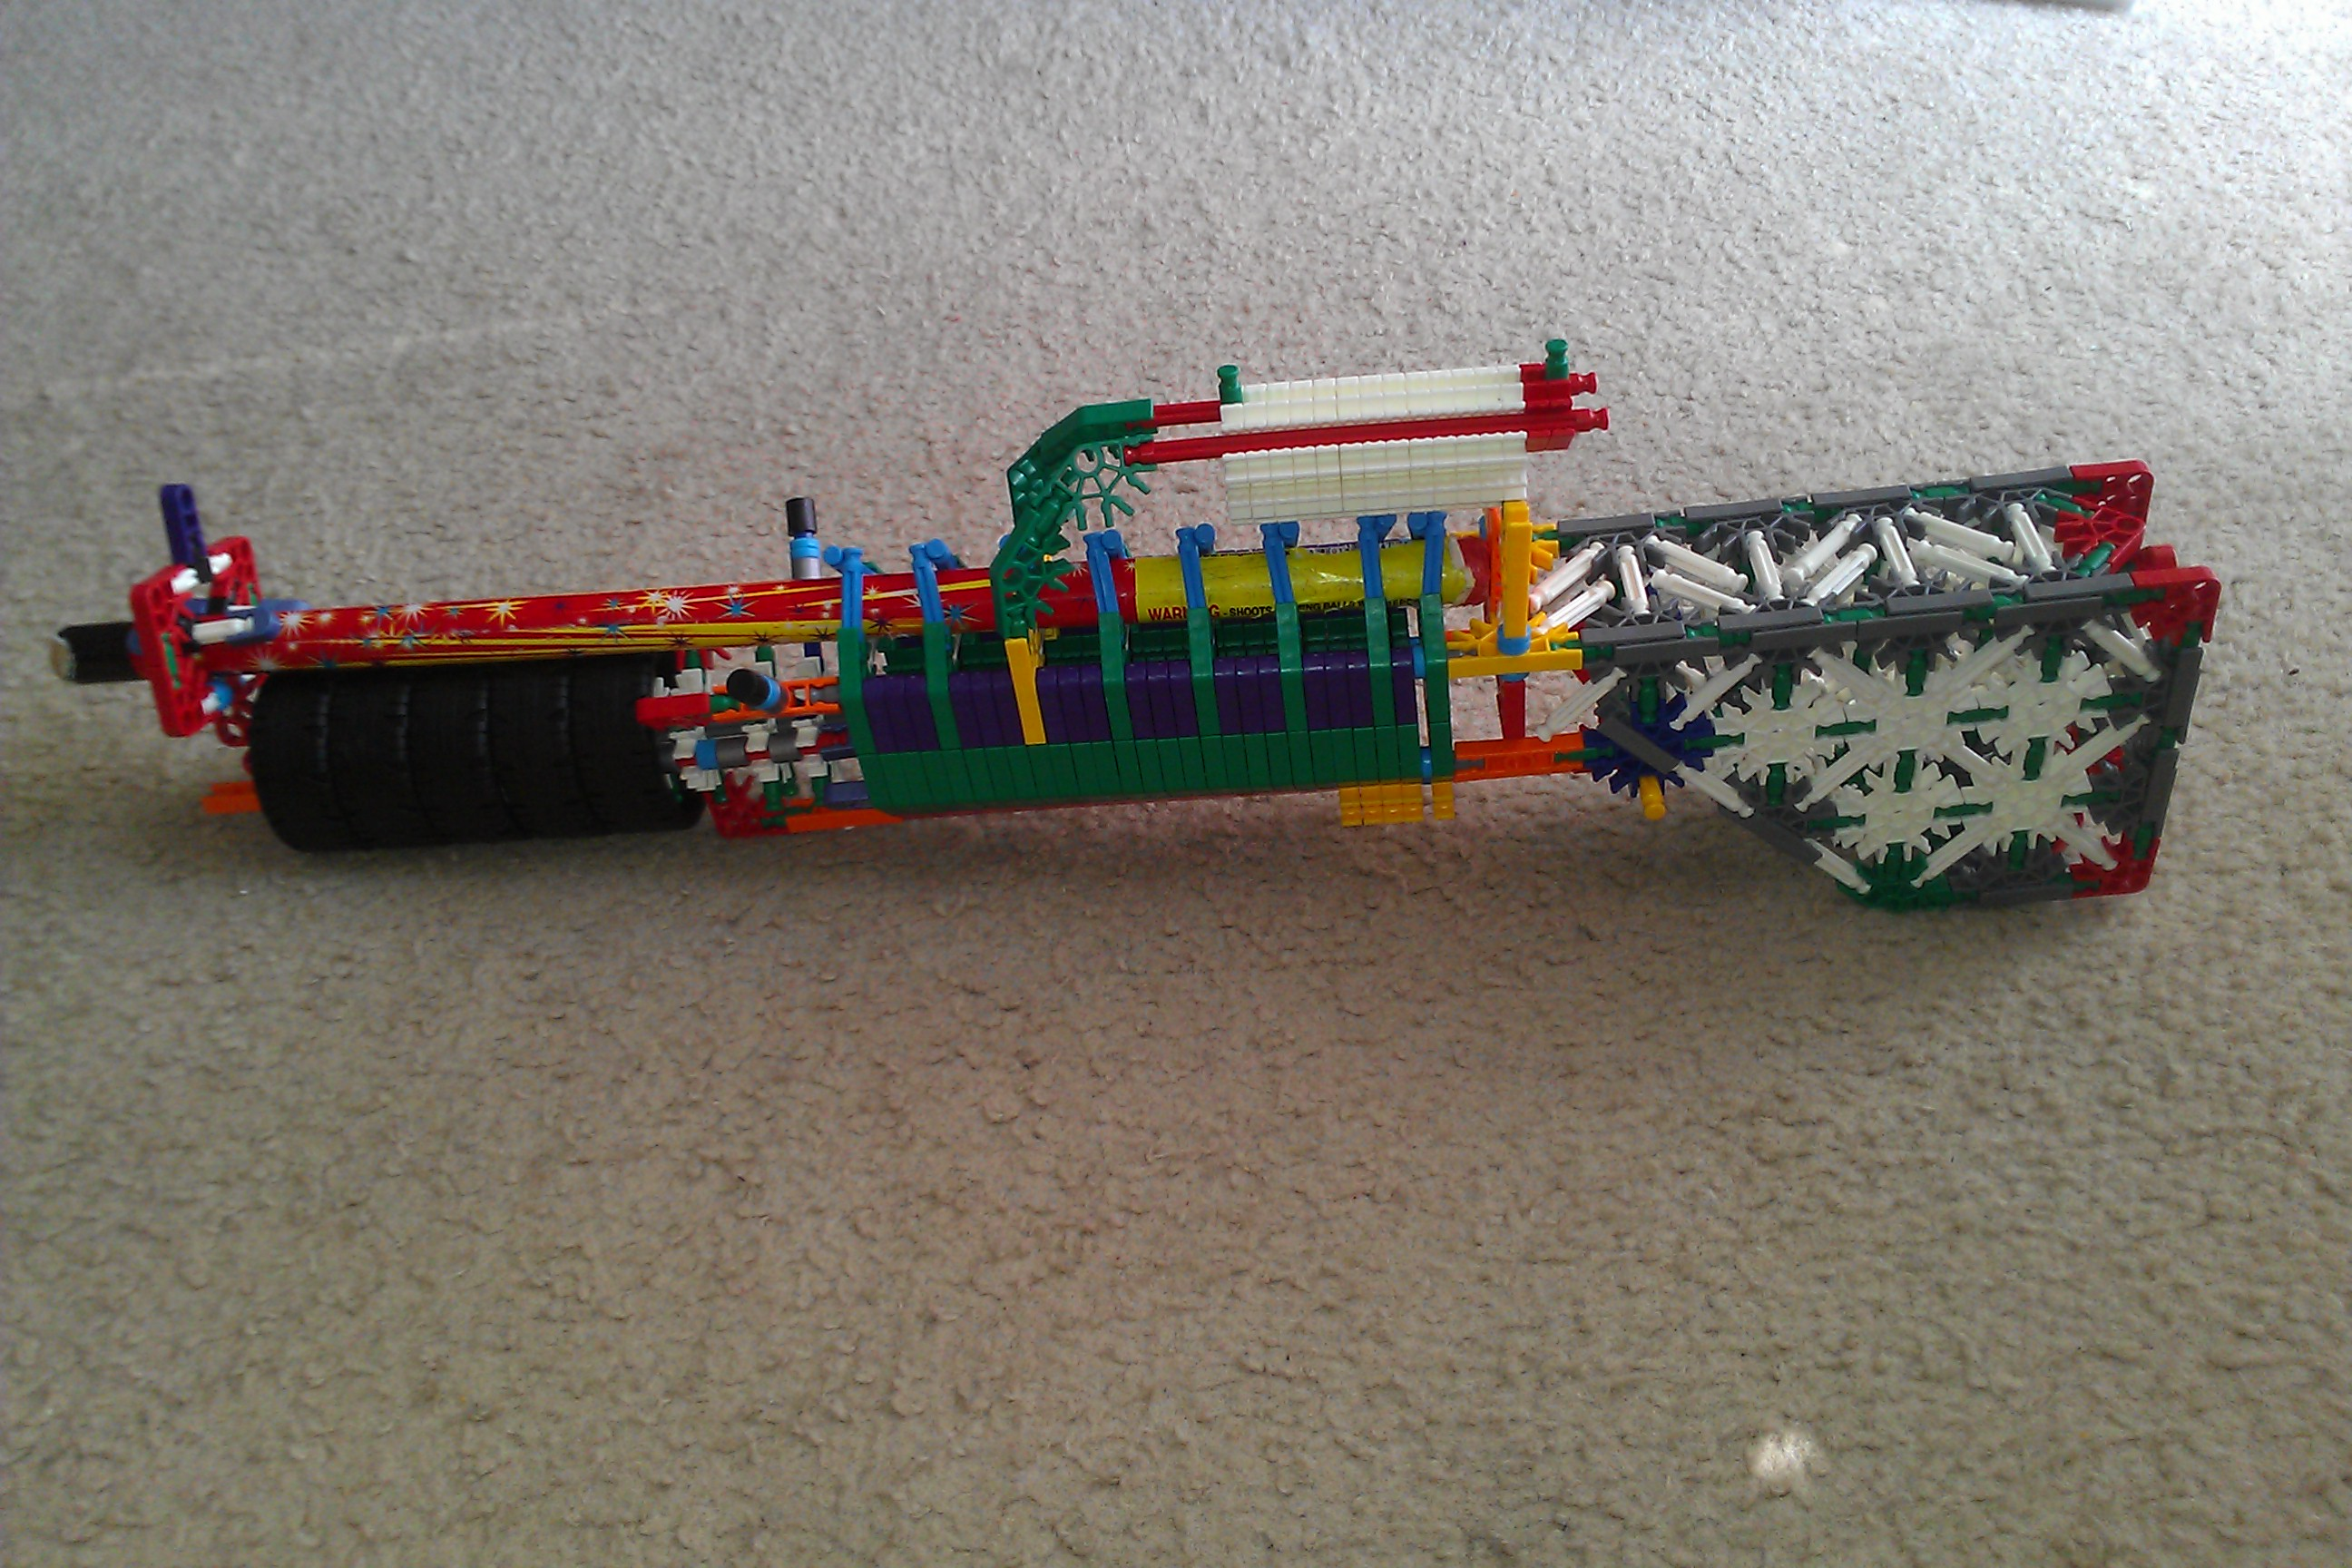 Picture of The NK Banshee: a Roman Candle Shooting K'nex Gun